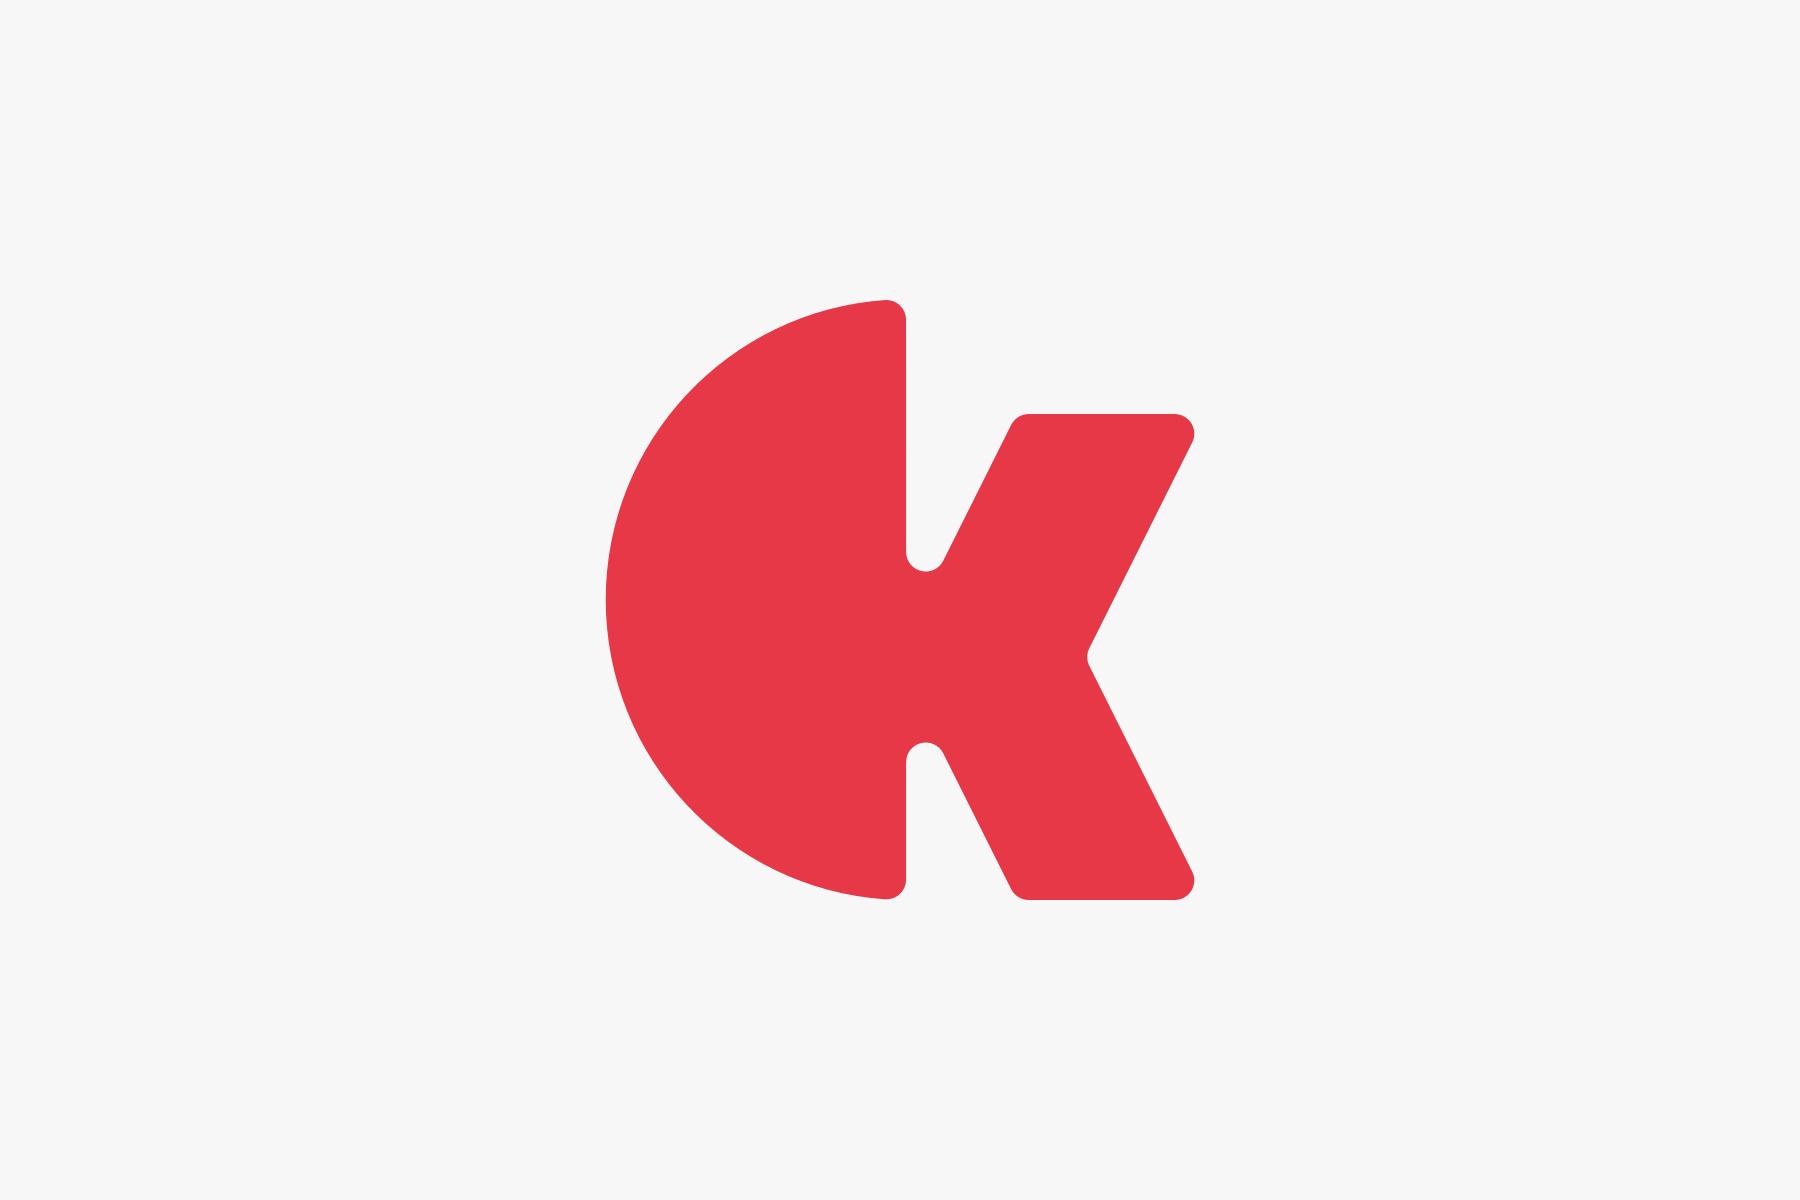 36 Days of Type - K